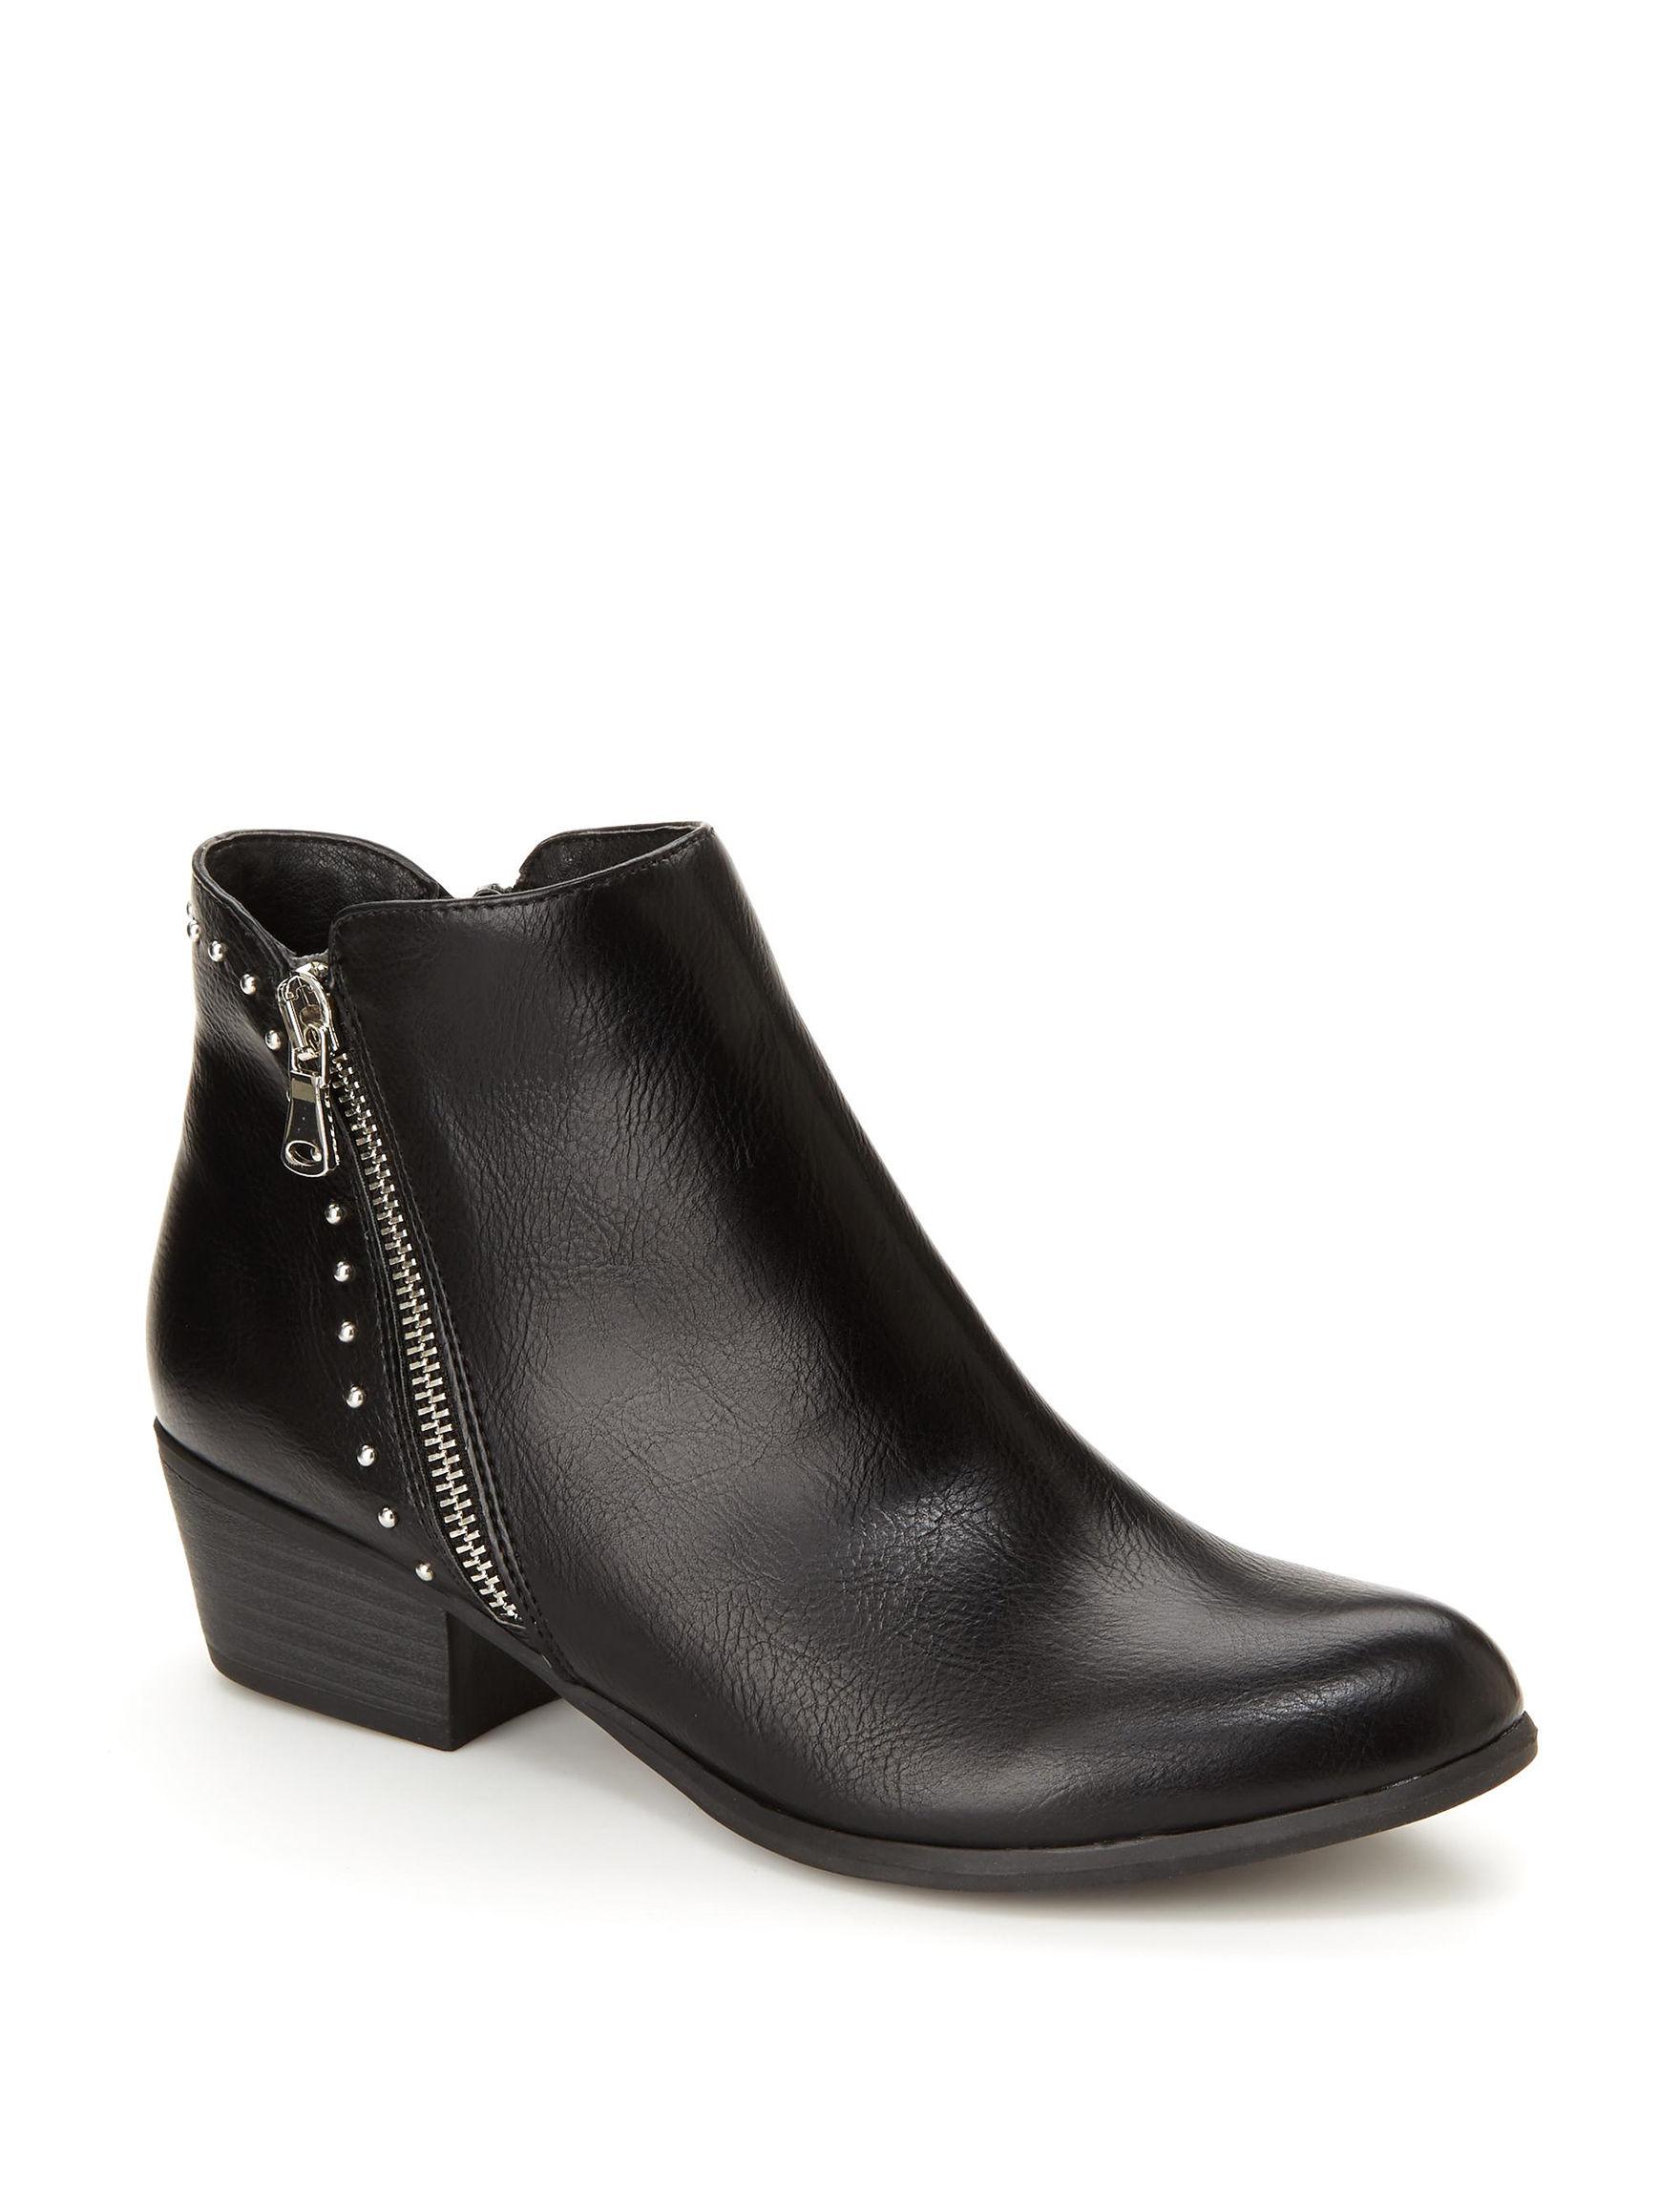 Esprit Black Ankle Boots & Booties